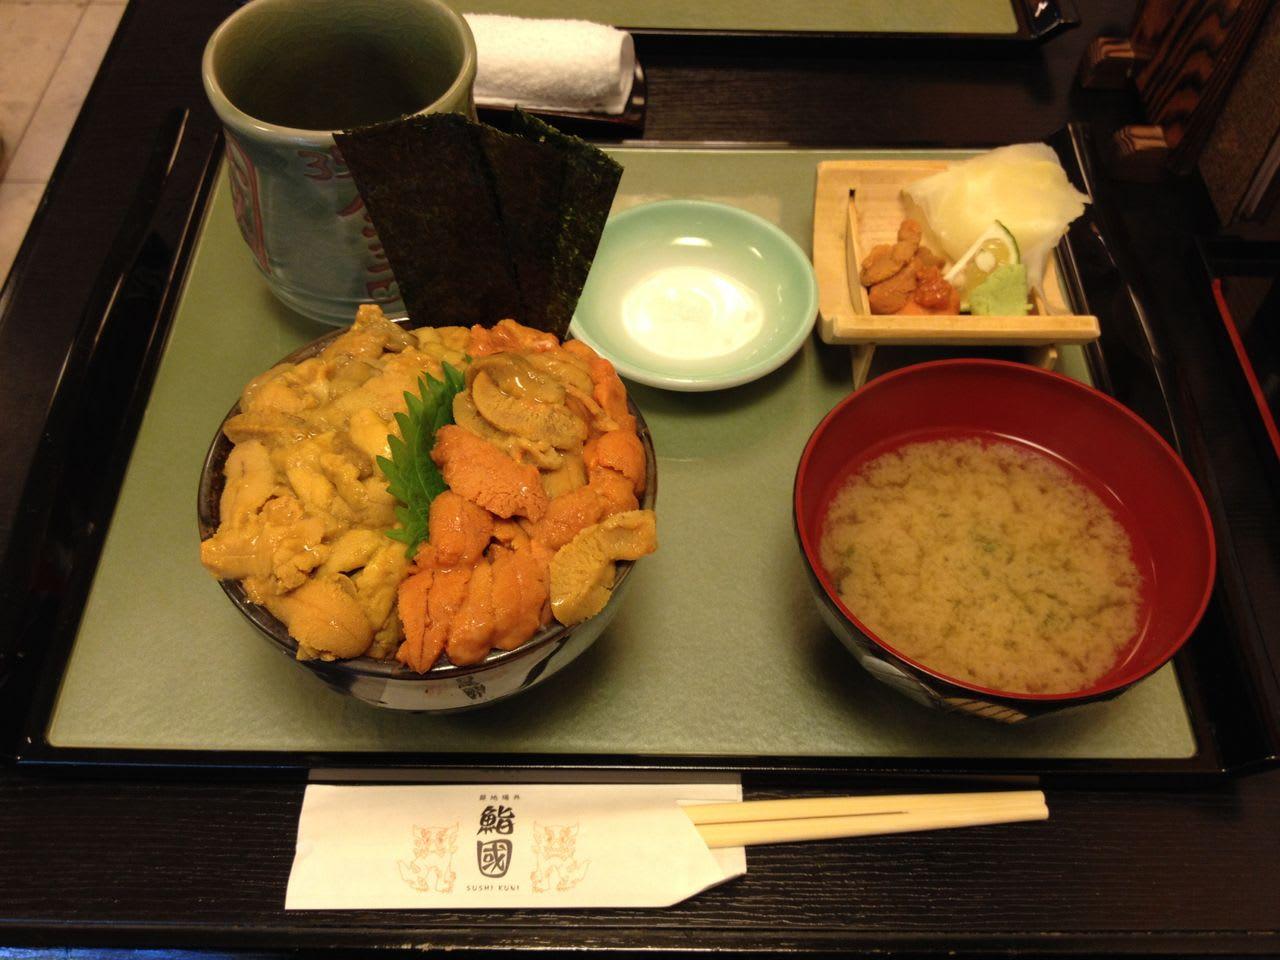 Look at this impressive original Ganso Kobore-uni-don (Overflowing Sea Urchin-don)!